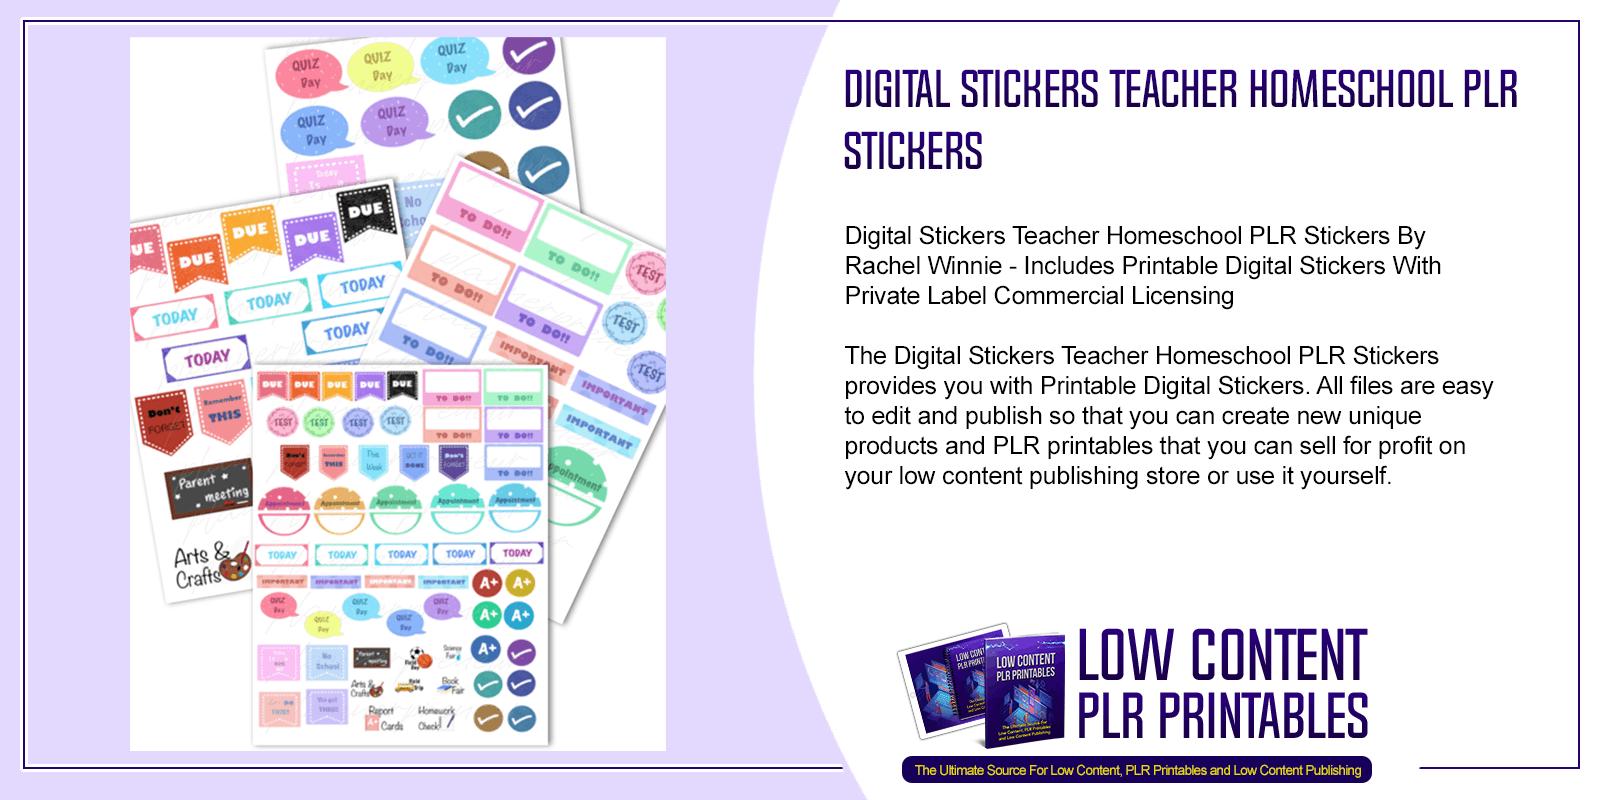 Digital Stickers Teacher Homeschool PLR Stickers